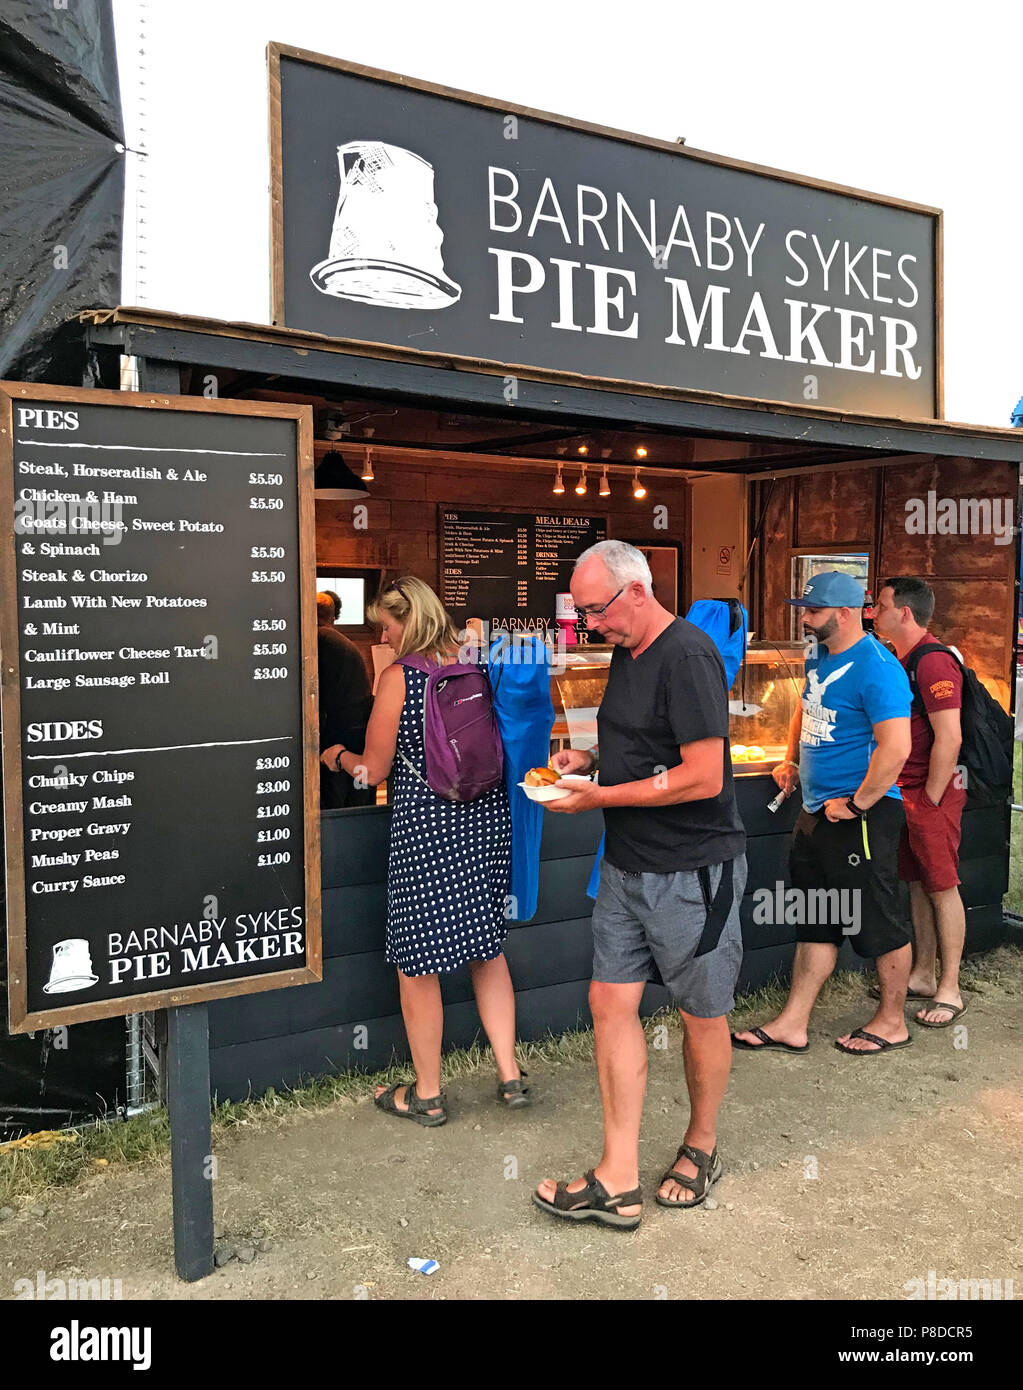 @HotpixUK,GoTonySmith,Silverstone,racing circuit,F1,GP,Formula One,Grand Prix,GrandPrix,2018,Northampton,England,UK,shop,stand,food,hotfood,hot,who ate all the pies?,proper pies,Barnaby Sykes Pie Maker,Jubilee House,Swells Hill,Brimscombe,Stroud,Gloucestershire,GL5 2SR,GL5